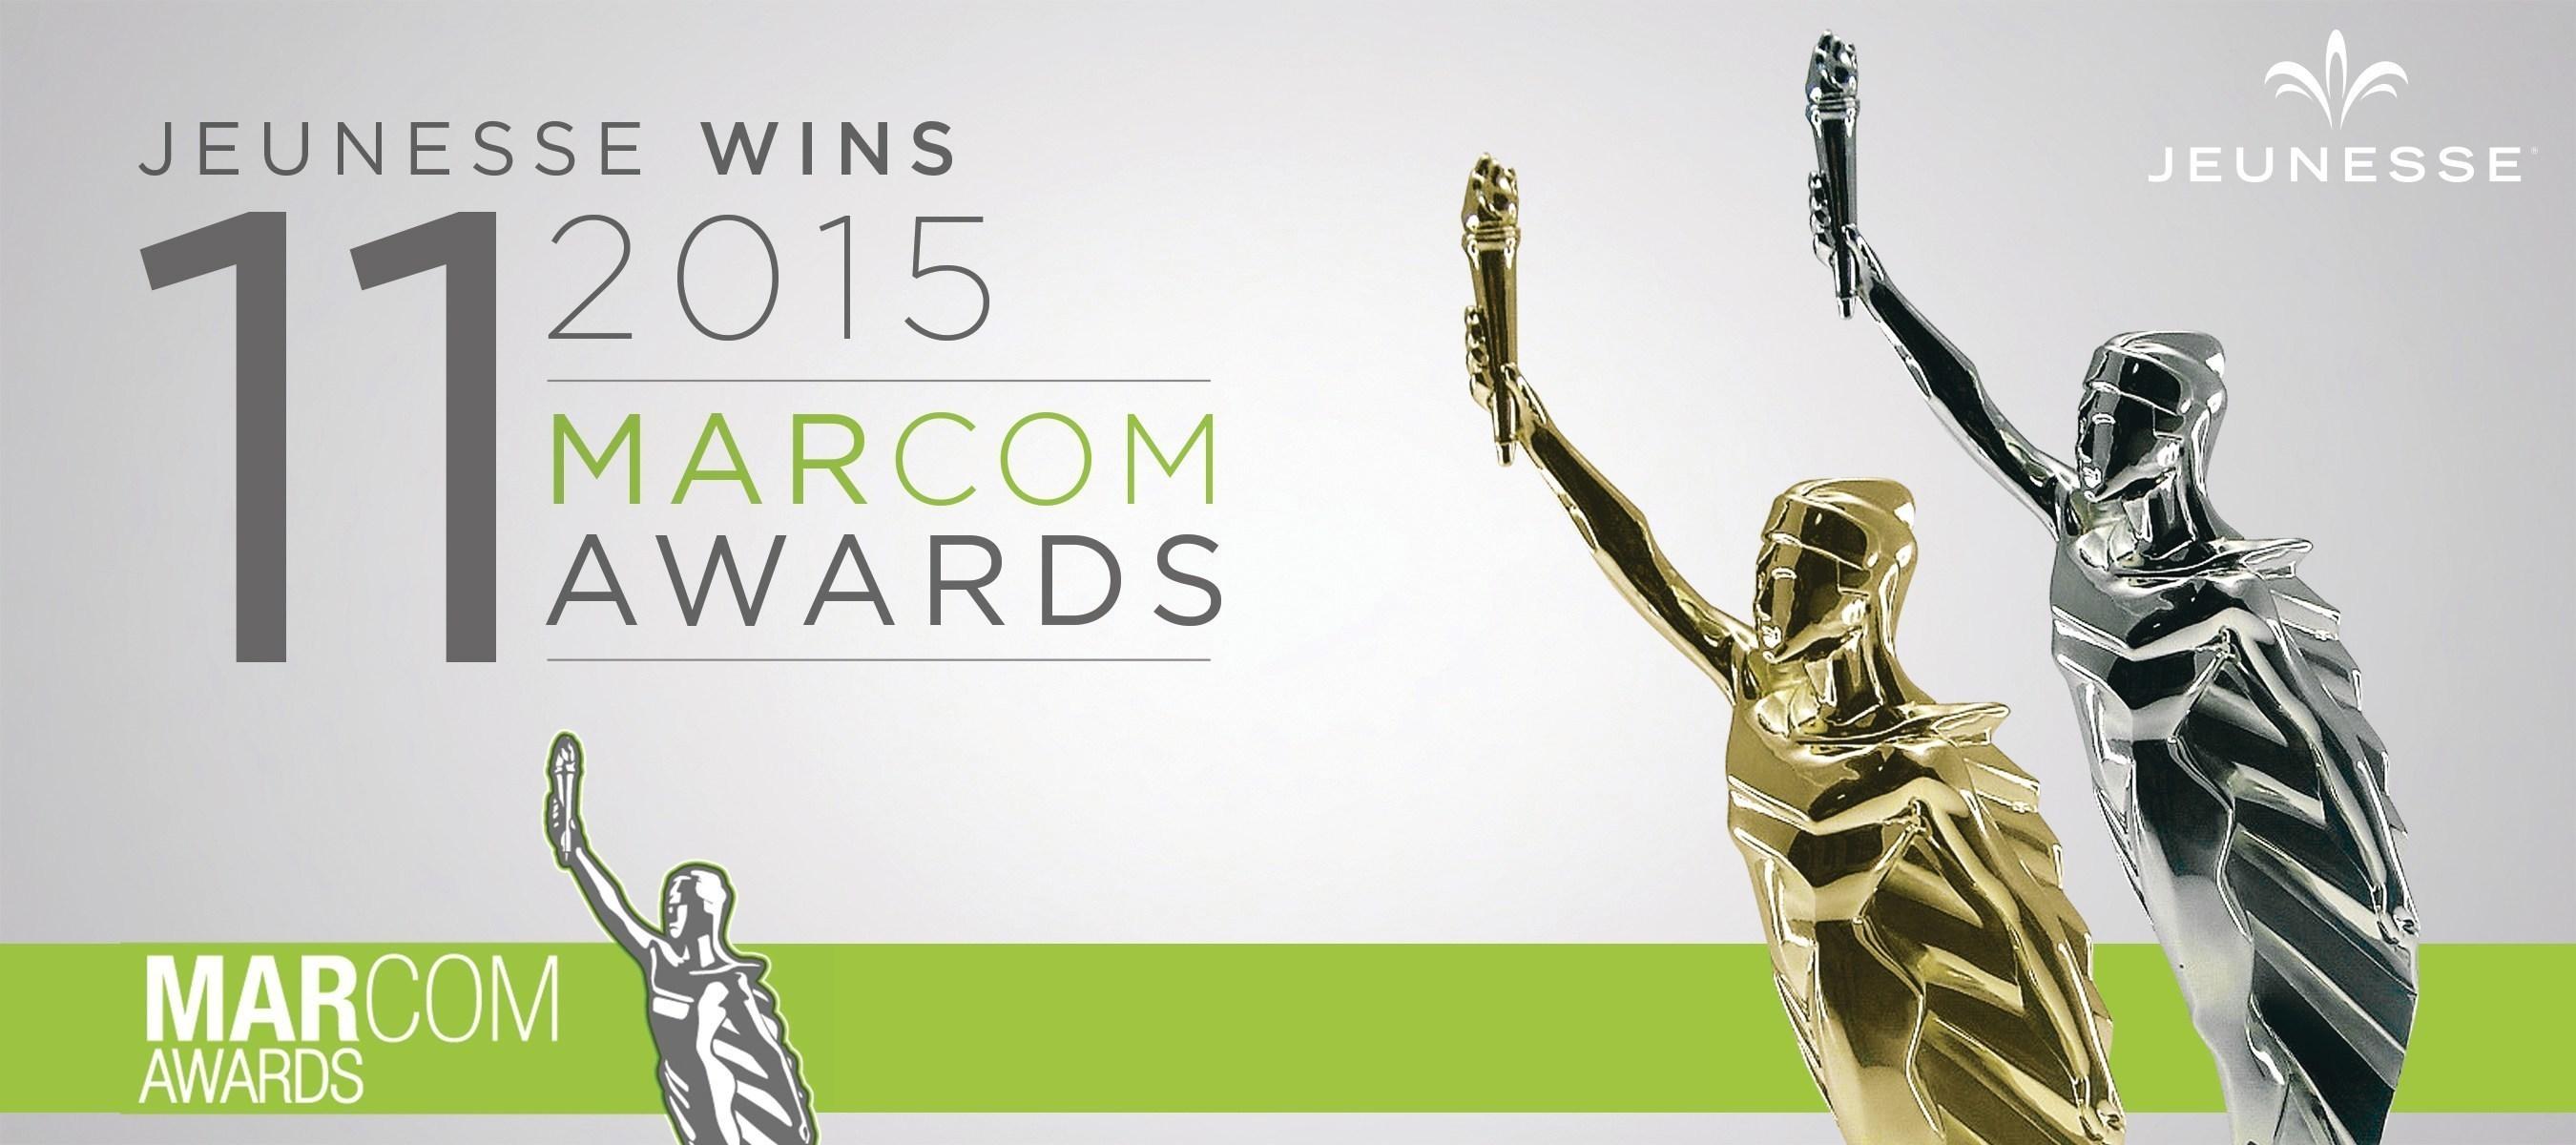 Jeunesse Garners 11 Awards in Prestigious MarCom Competition